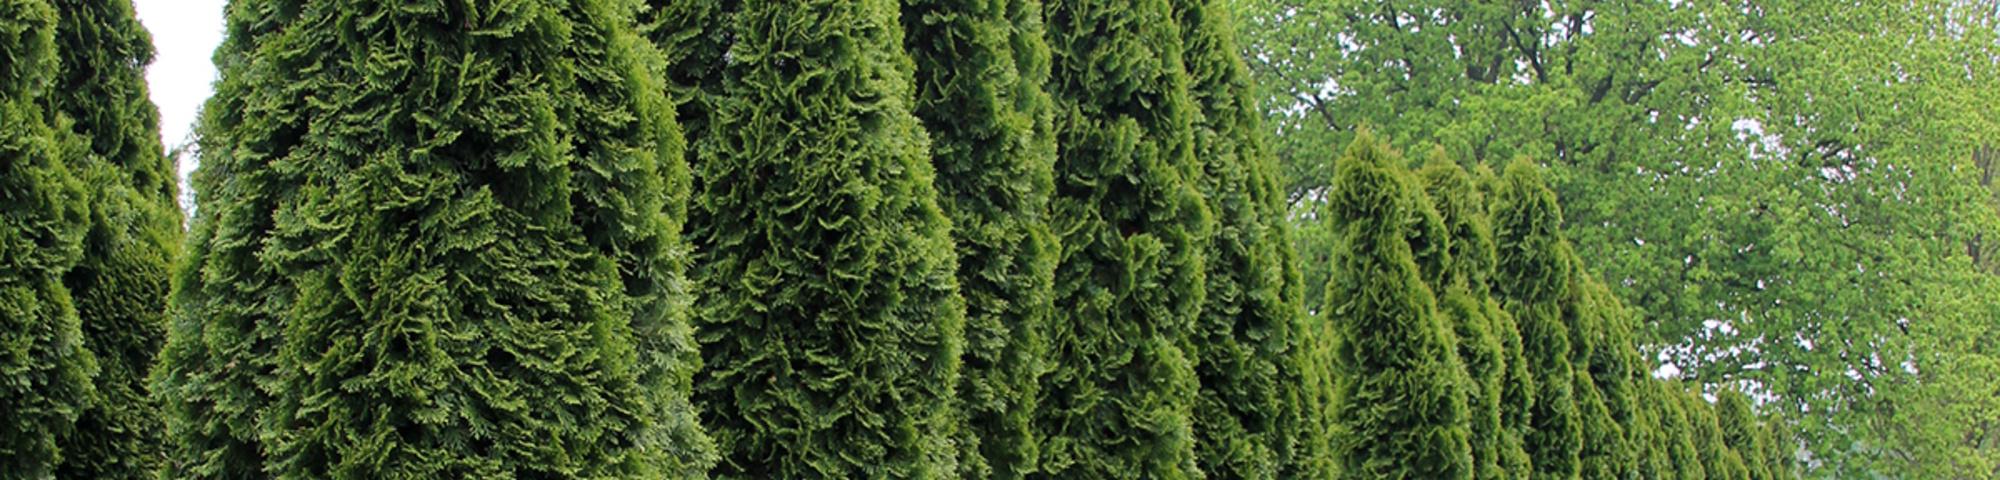 thuja occidentalis 39 smaragd 39 treeebb baumsuchmaschine. Black Bedroom Furniture Sets. Home Design Ideas